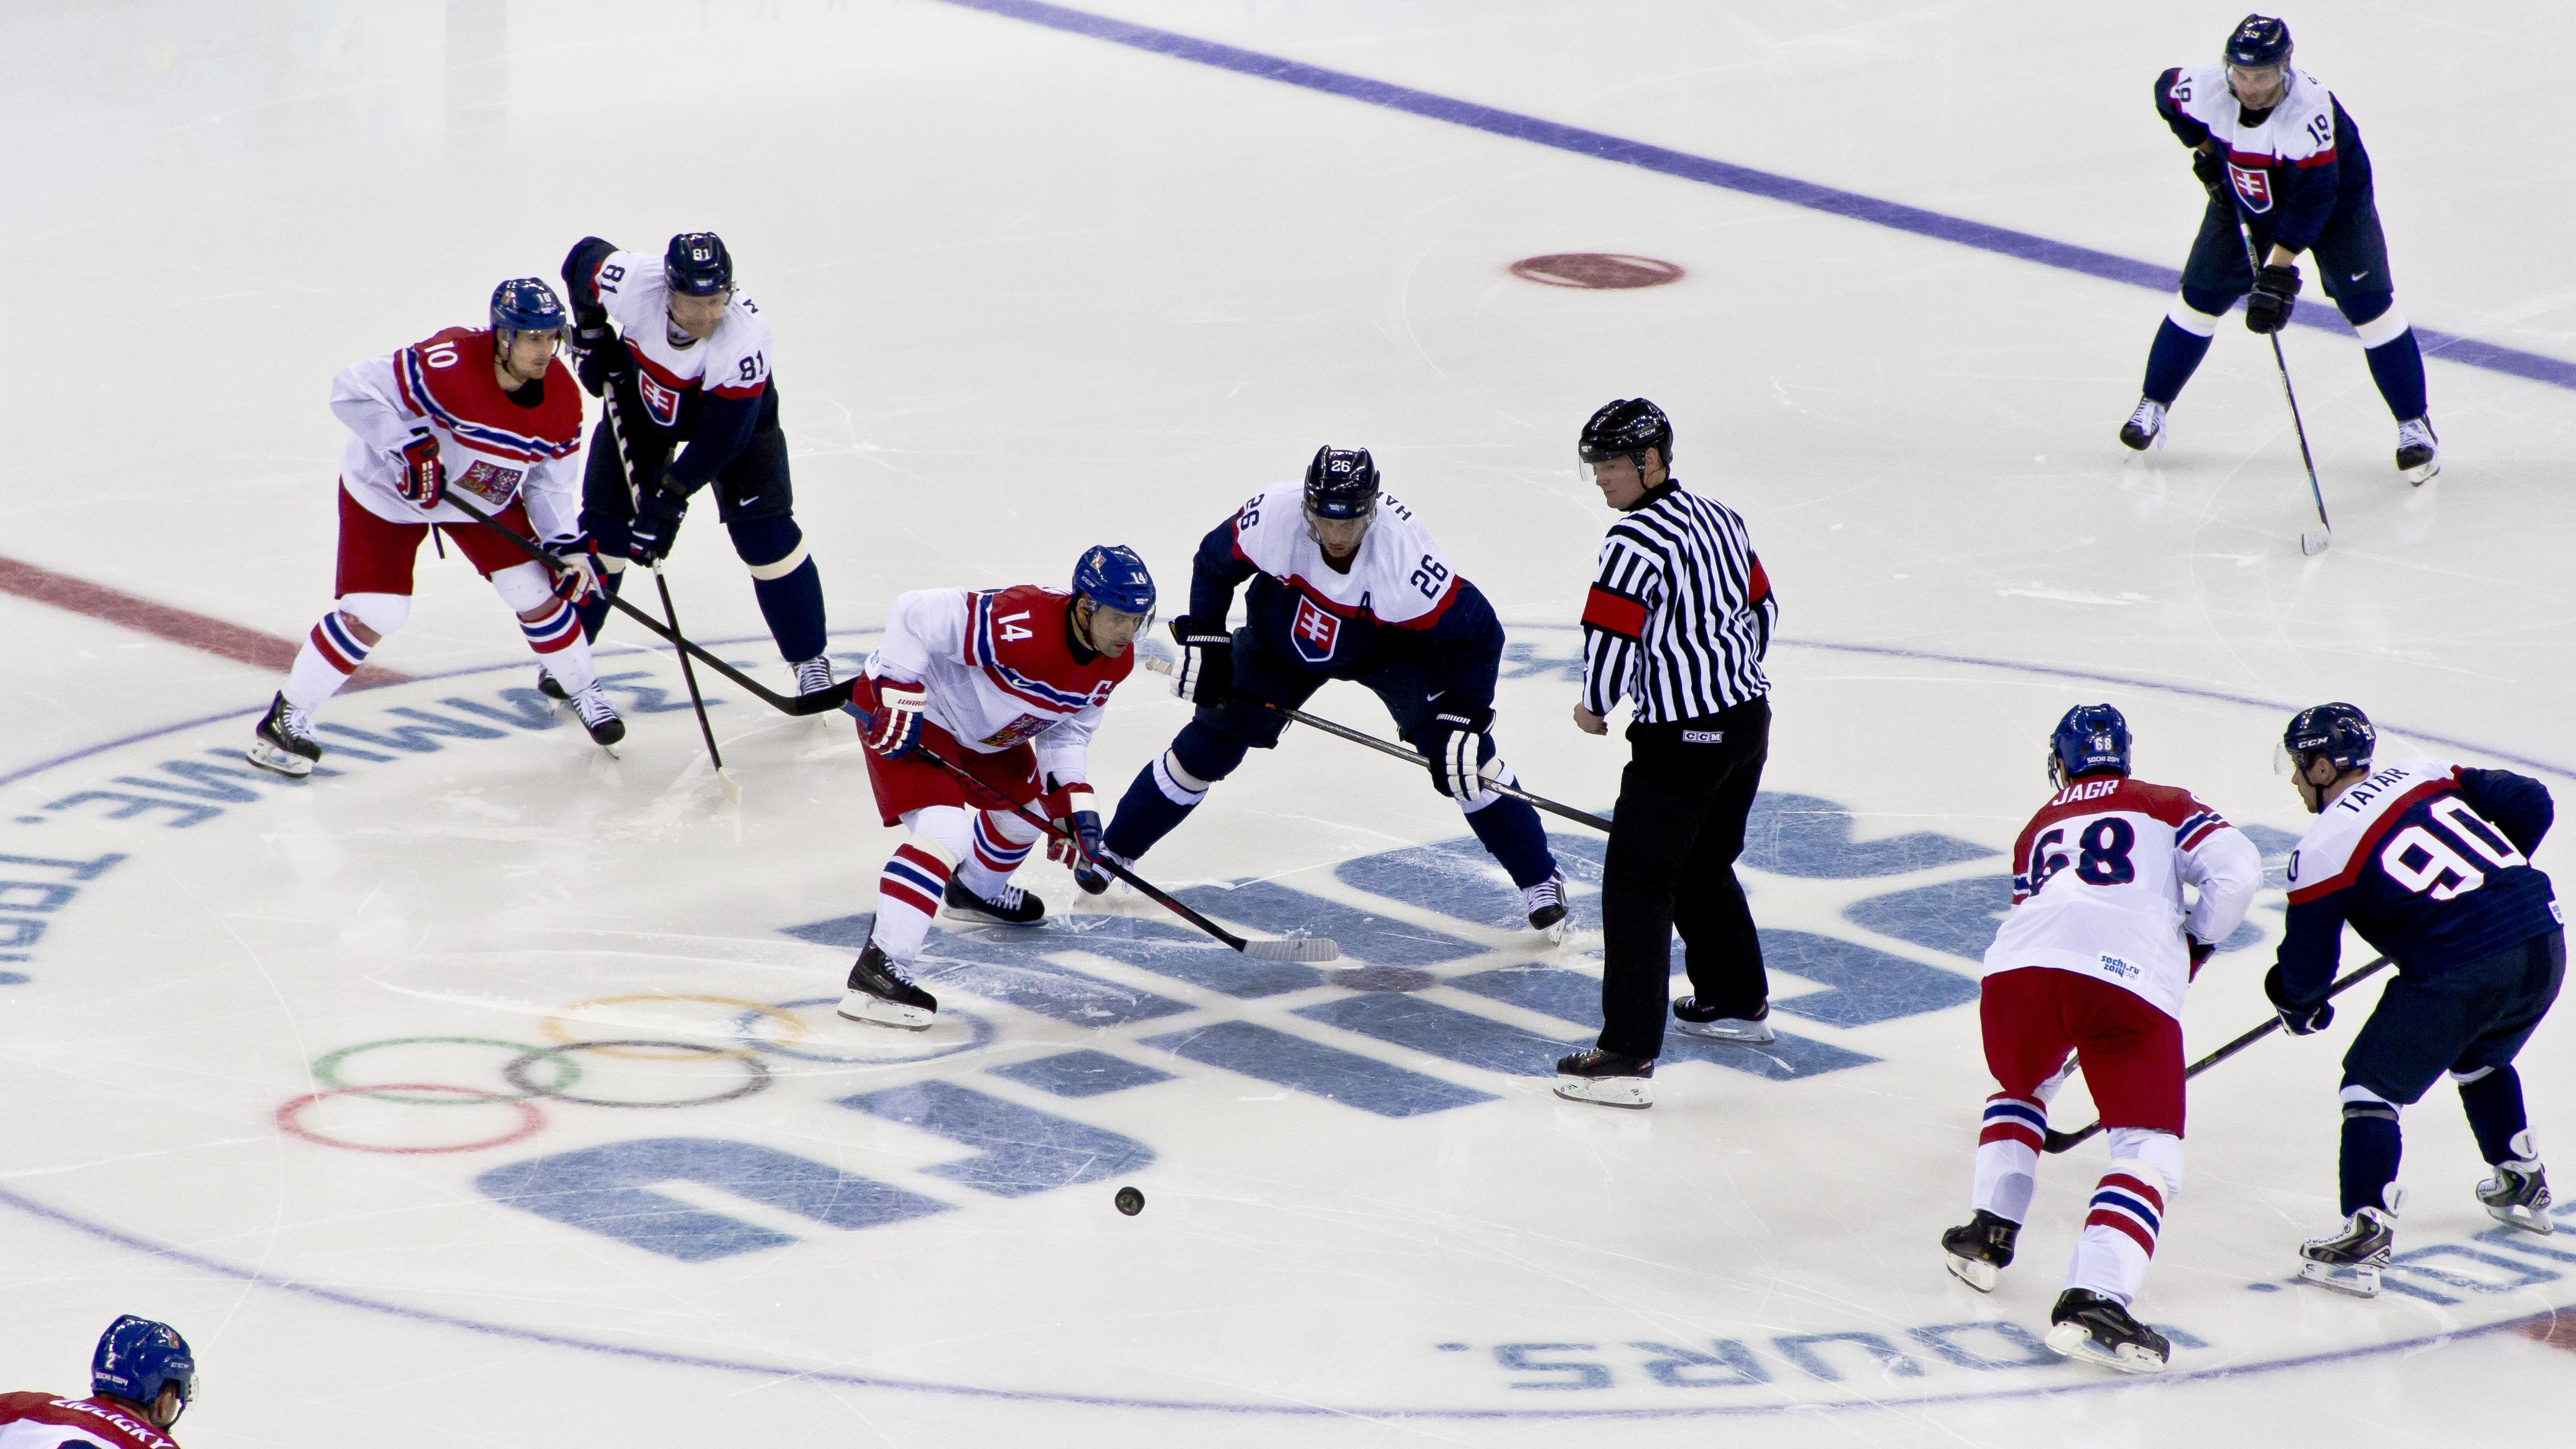 Los Angeles Quotes Wallpapers Hockey Backgrounds Pixelstalk Net